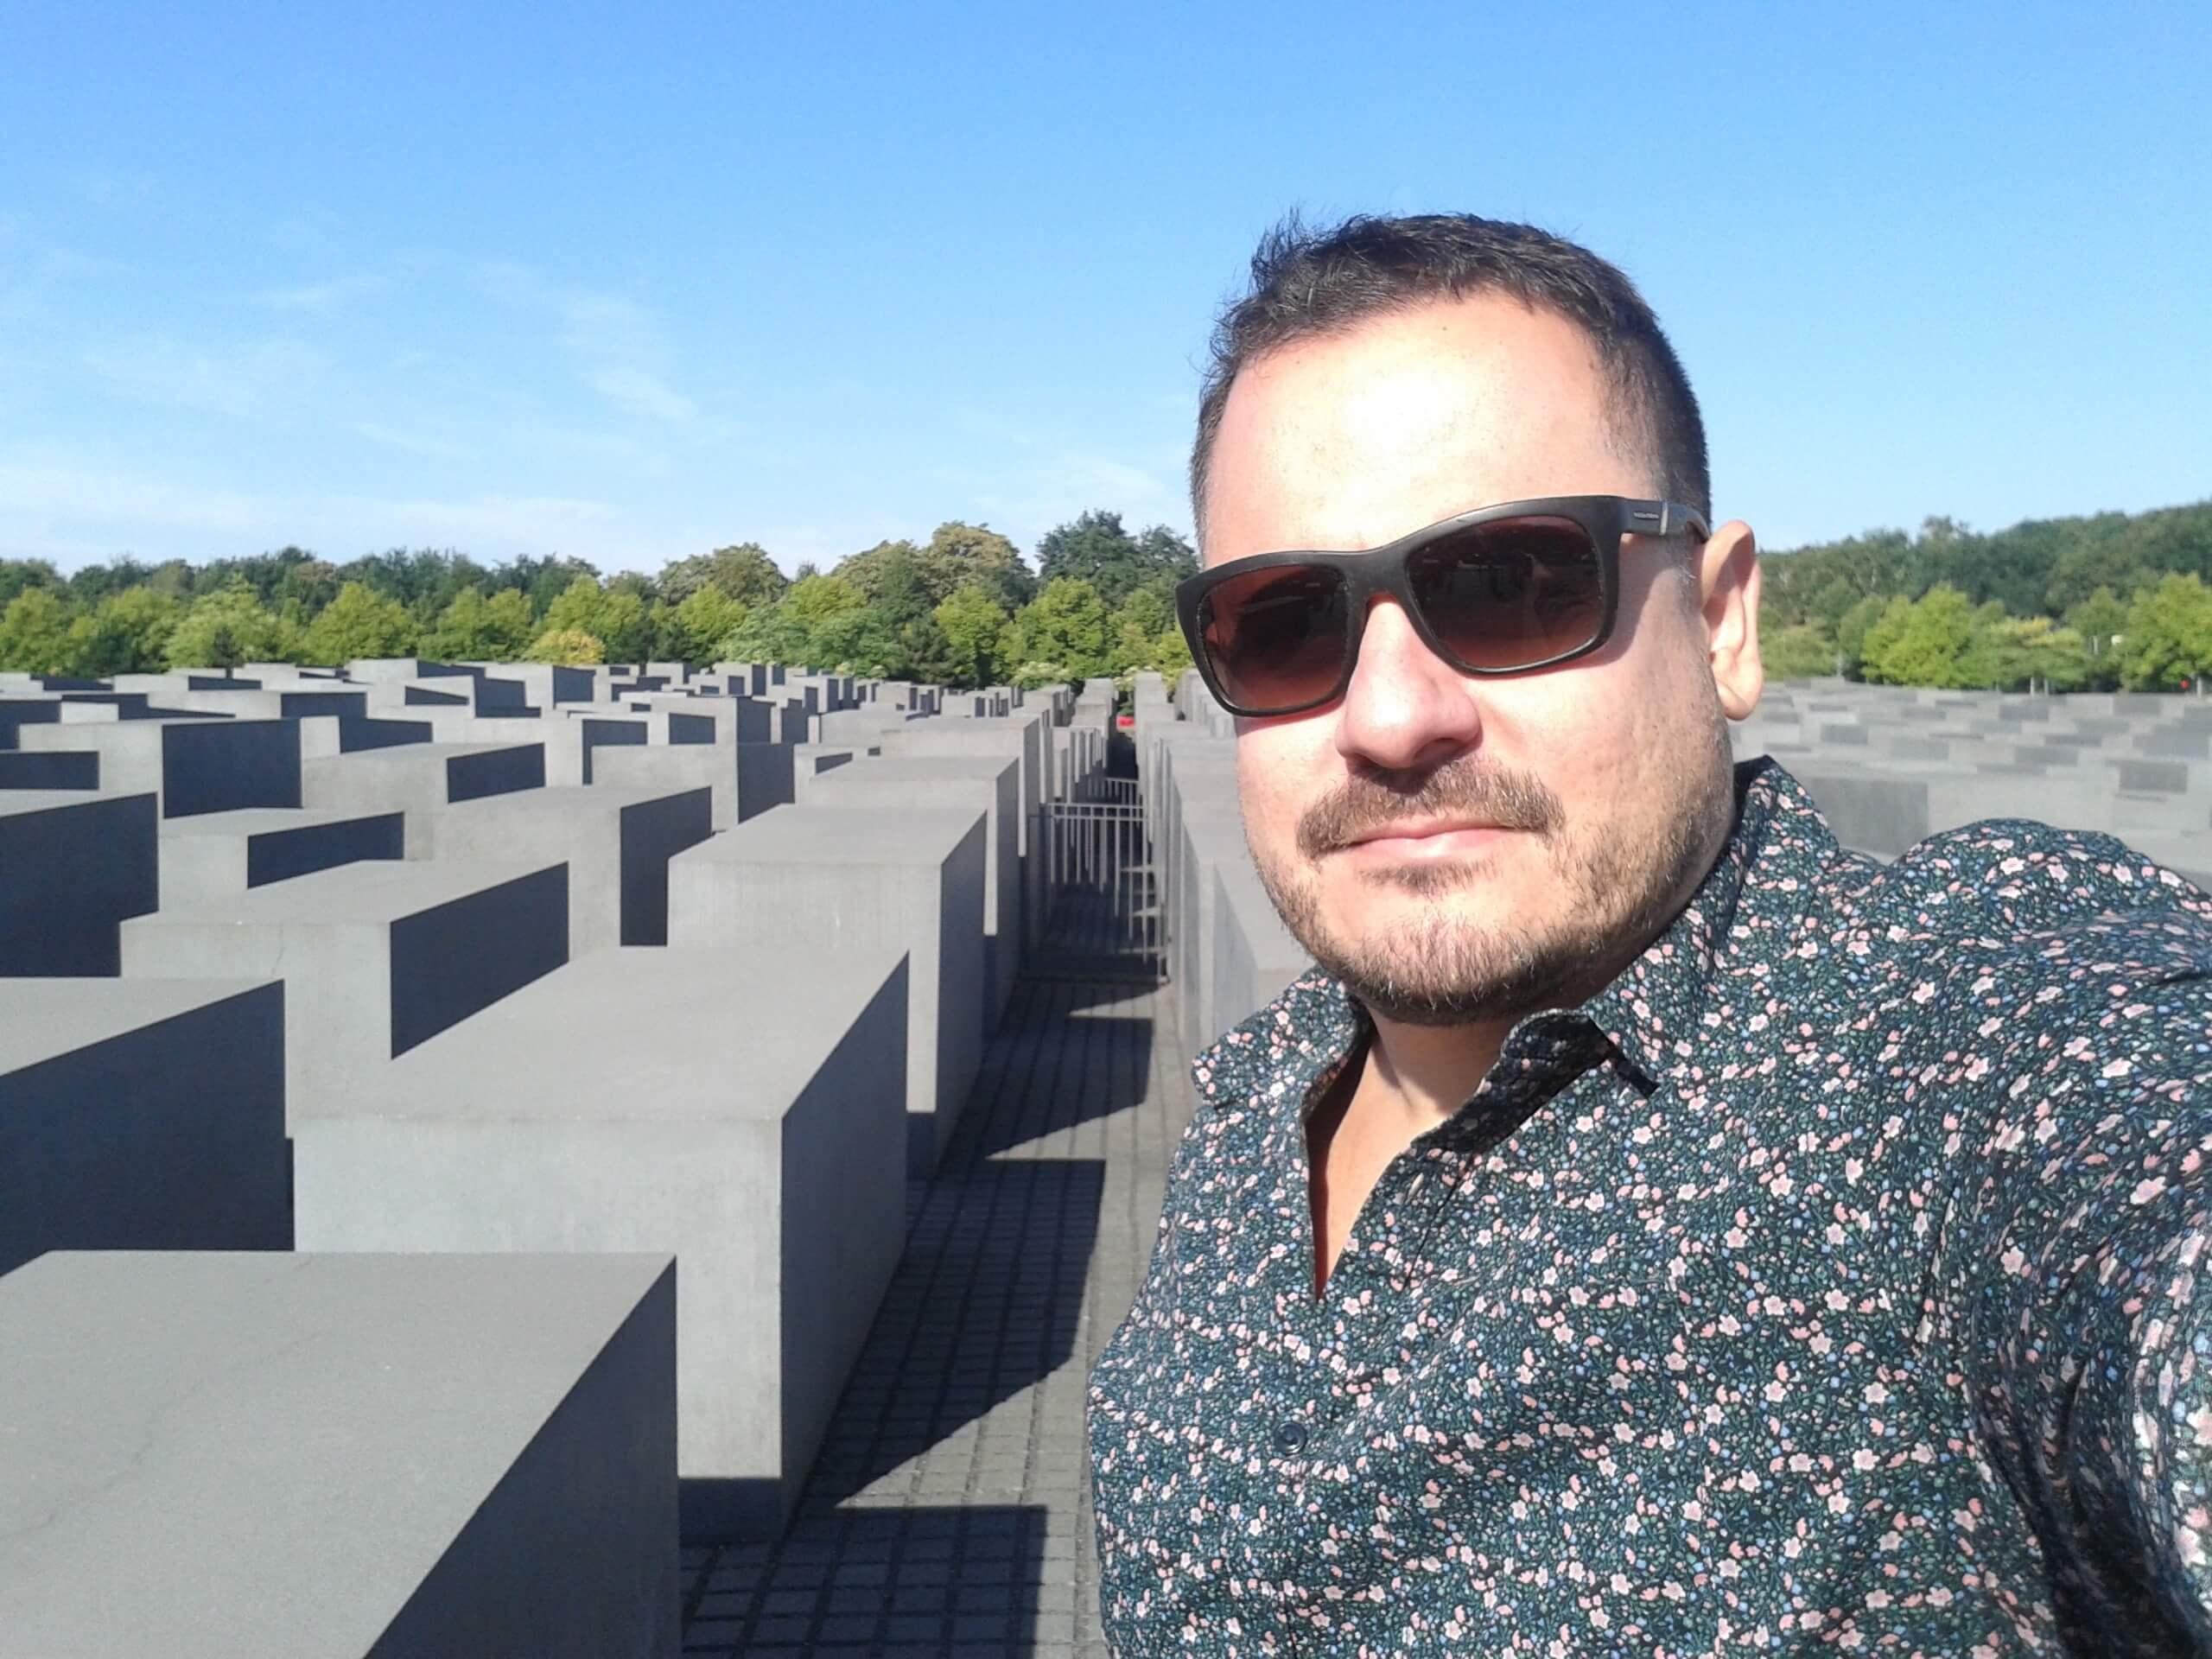 memorial-judeus-mortos-europa-berlim